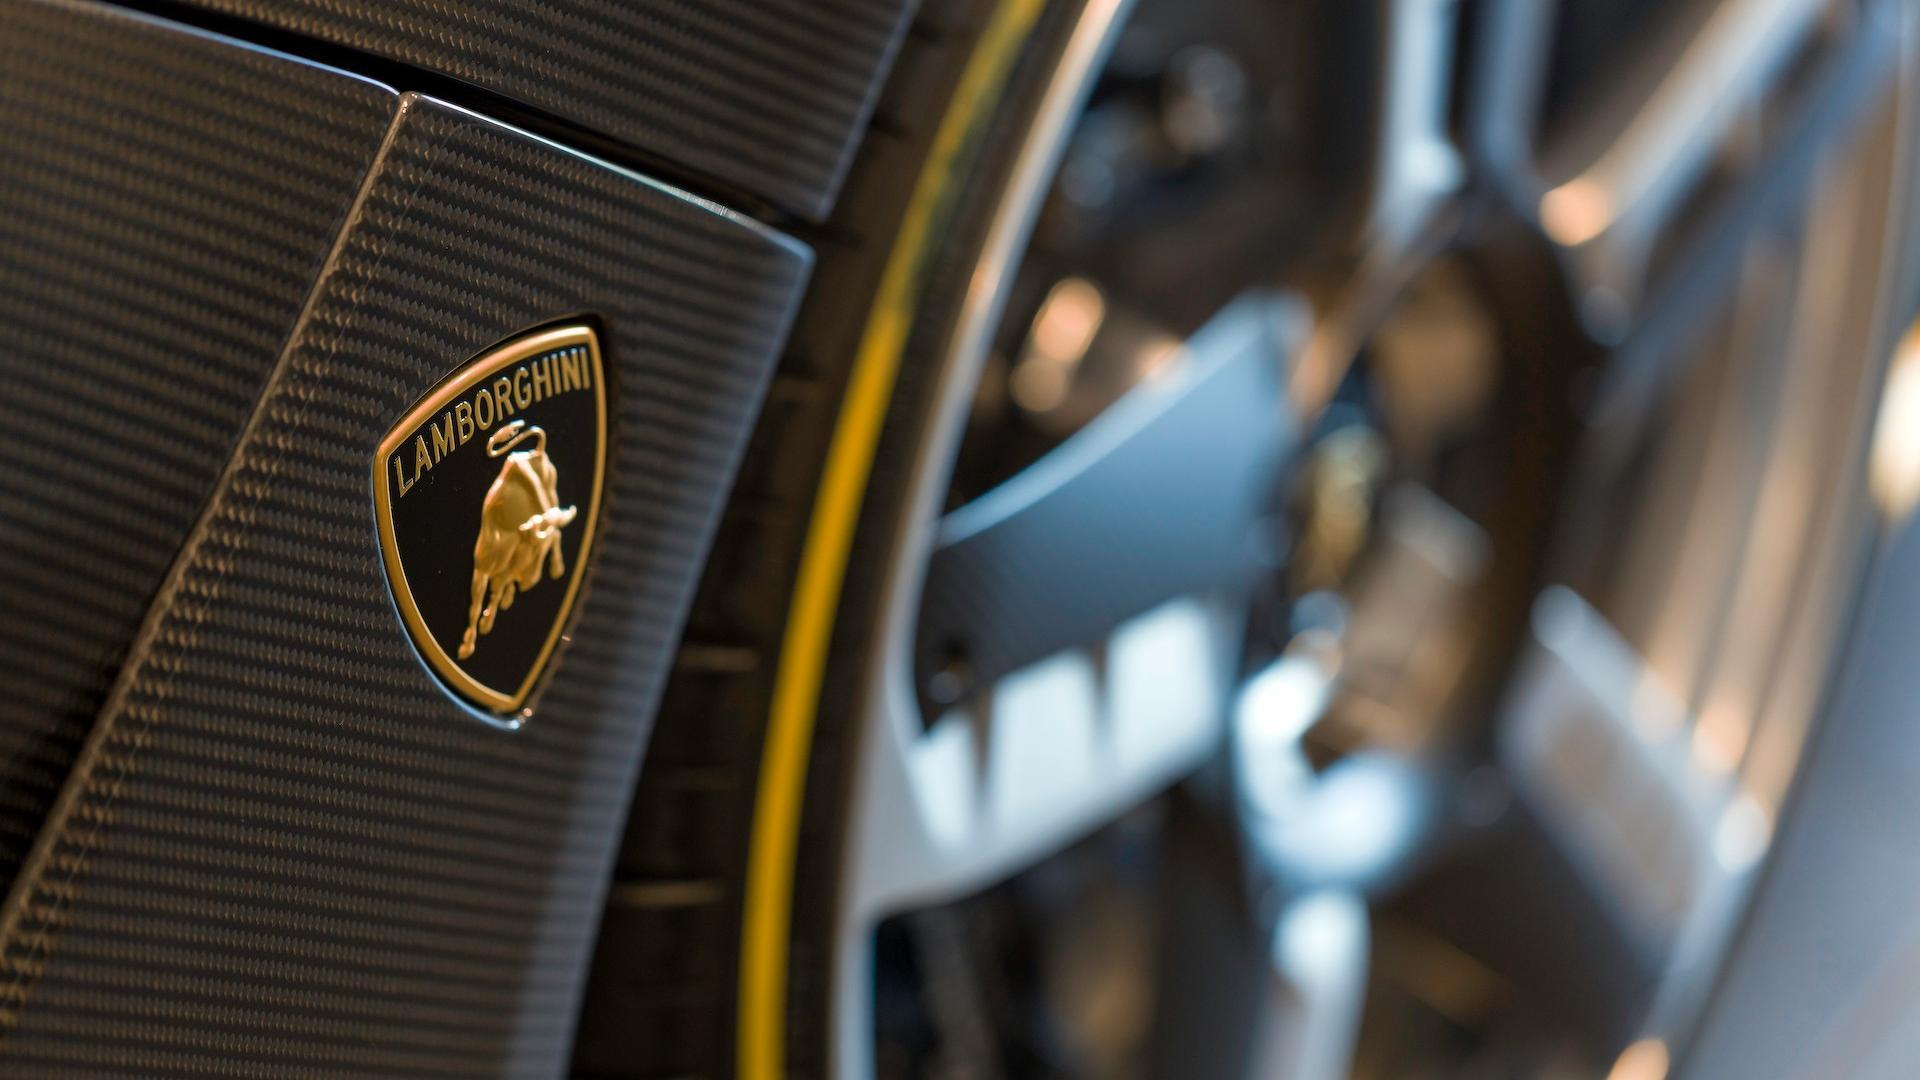 Lamborghini_Centenario_Roadster_12